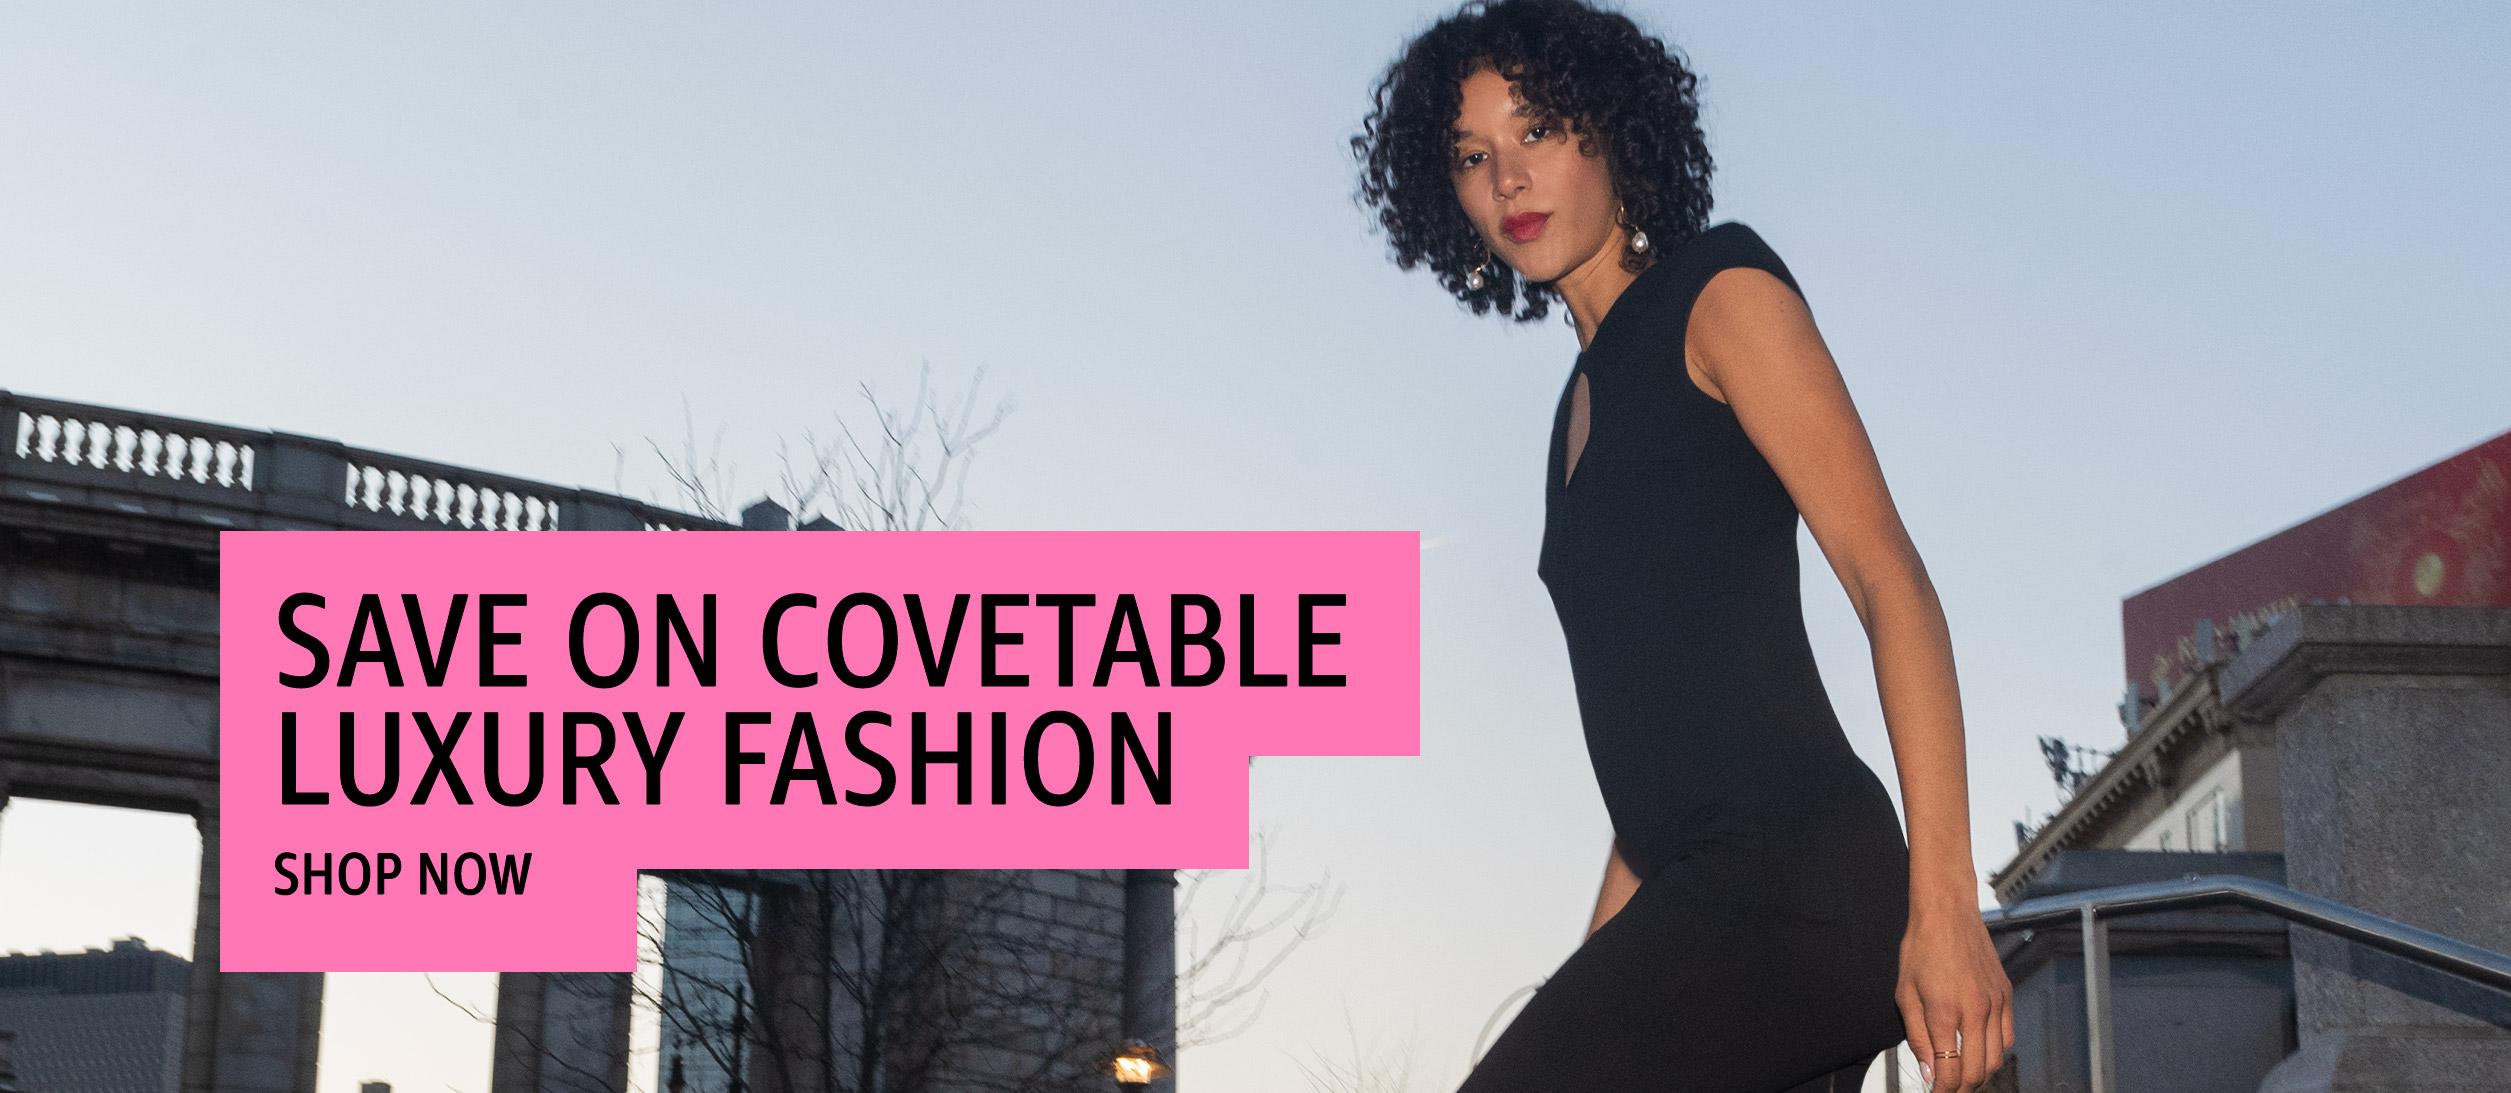 Save on Covetable Luxury Fashion